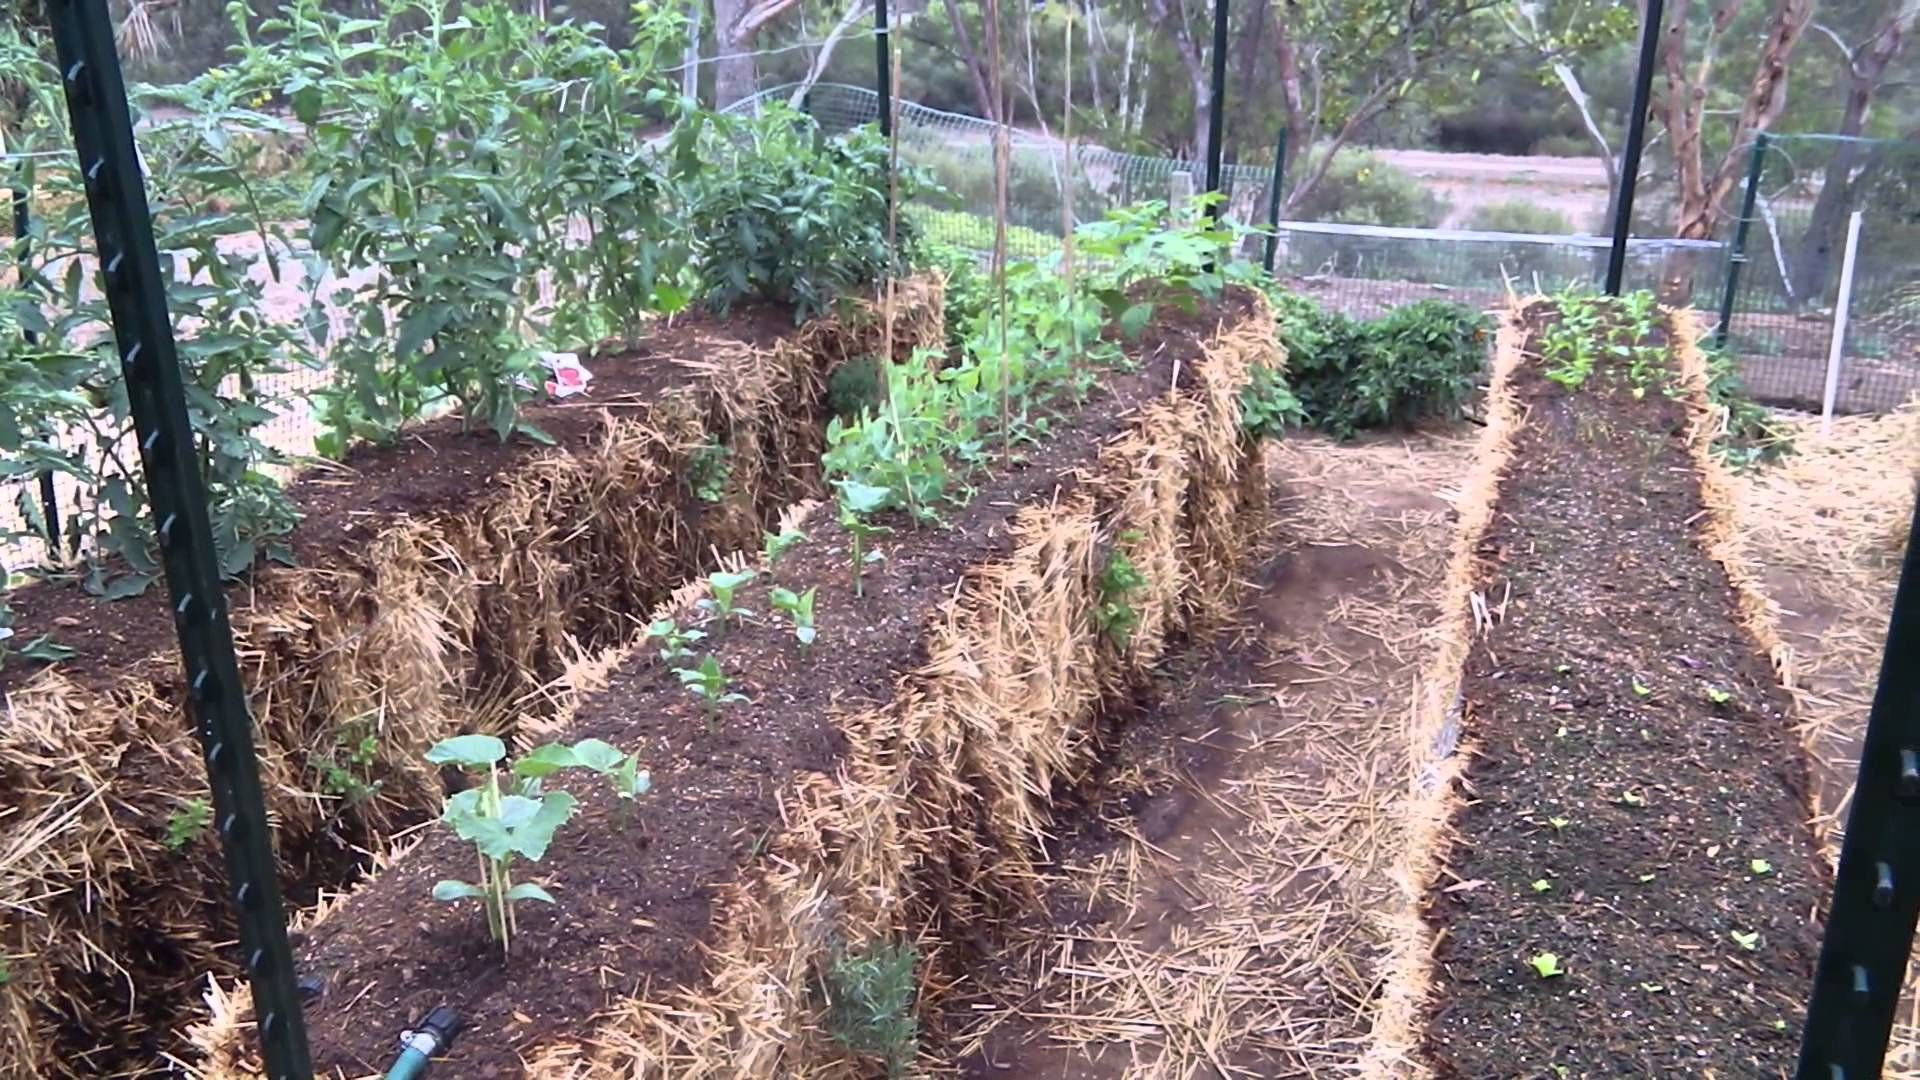 a891d1ea6684b712ebce11249359bc34 - Straw Bale Vs Hay Bale Gardening